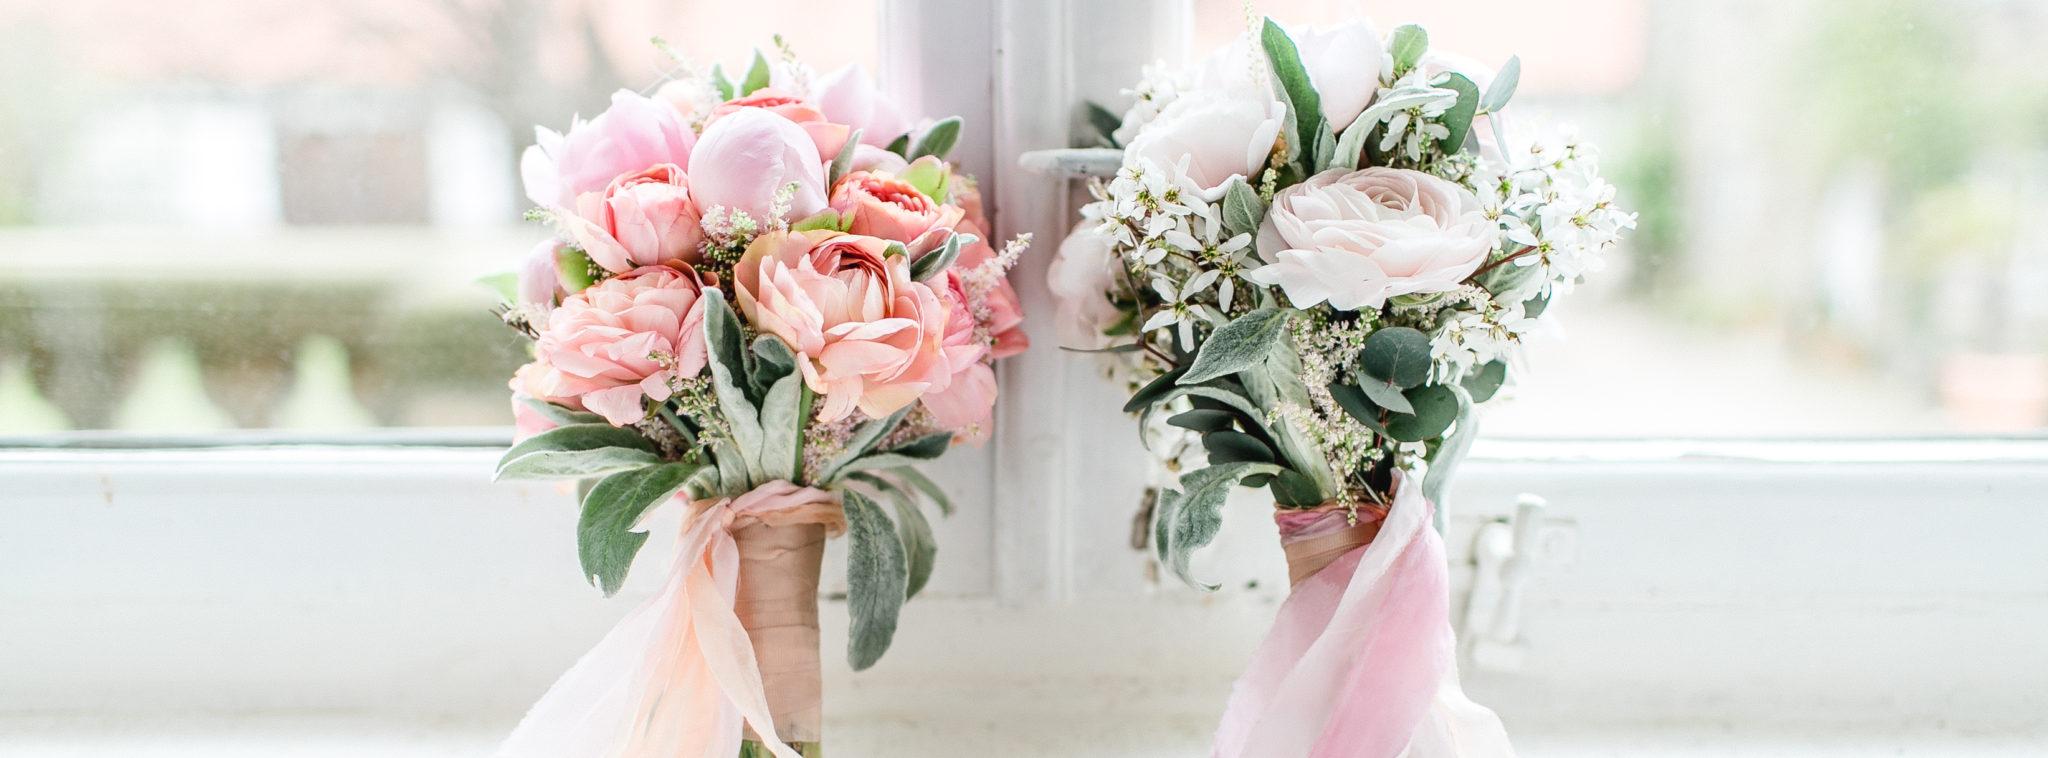 vintage wedding bridal bouquet